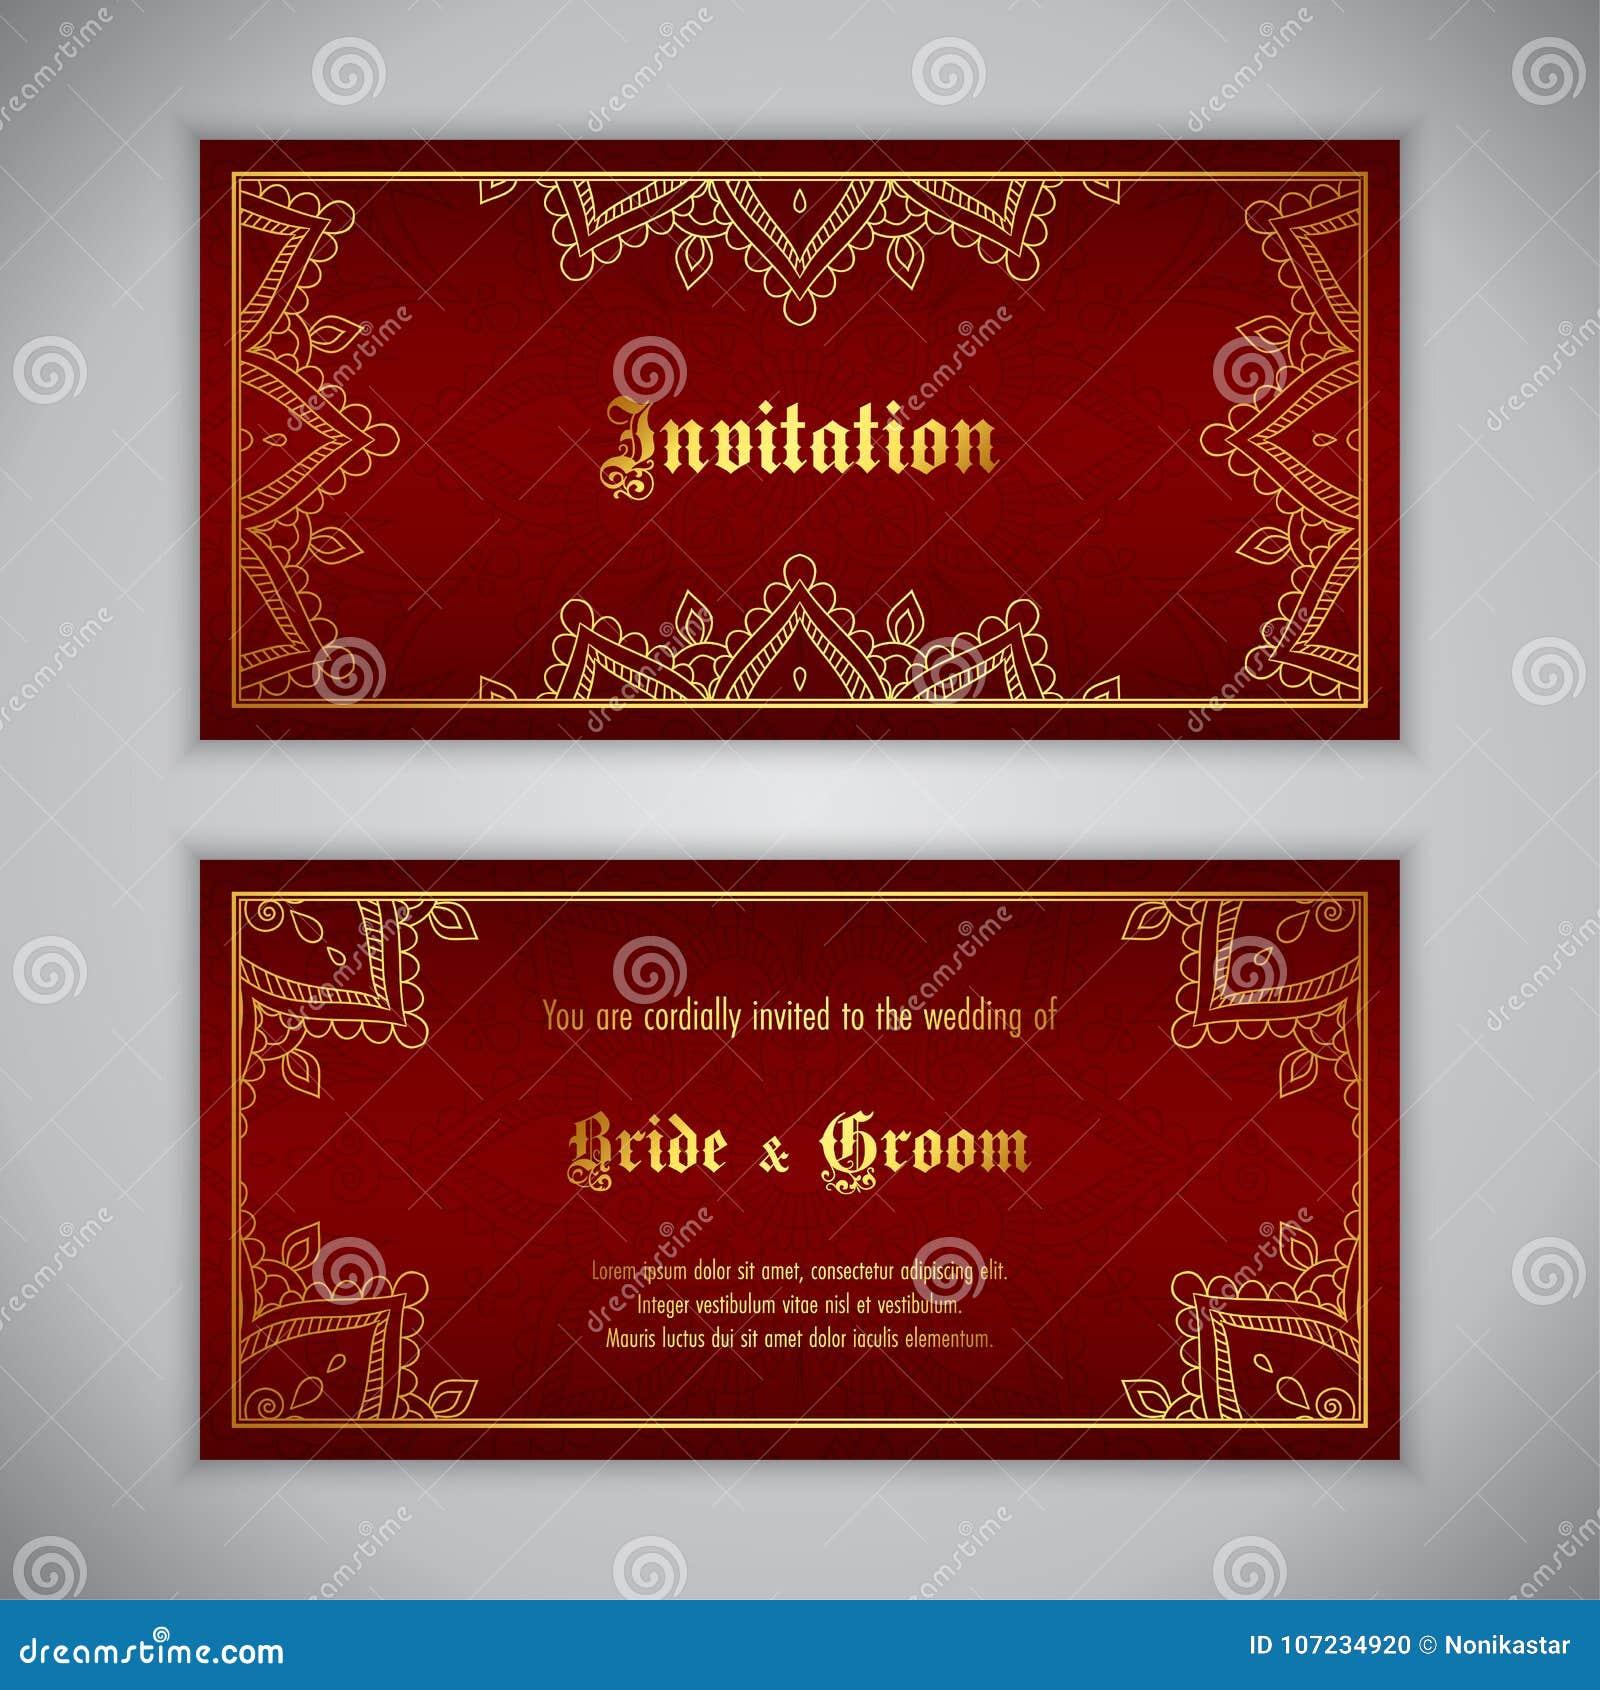 Luxury wedding invitation stock vector. Illustration of event ...